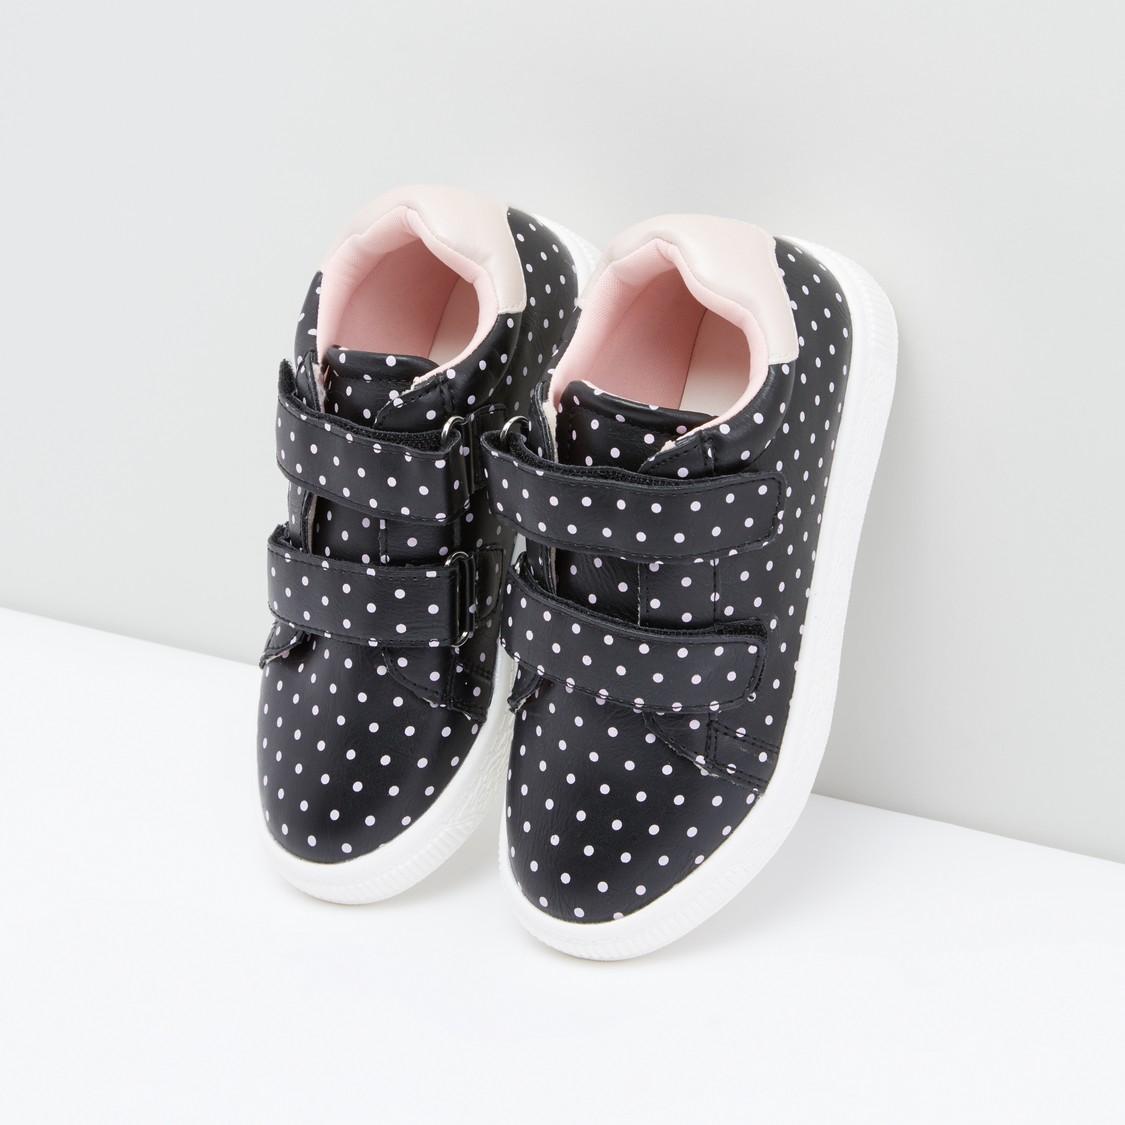 Printed Shoes with Hook and Loop Closure